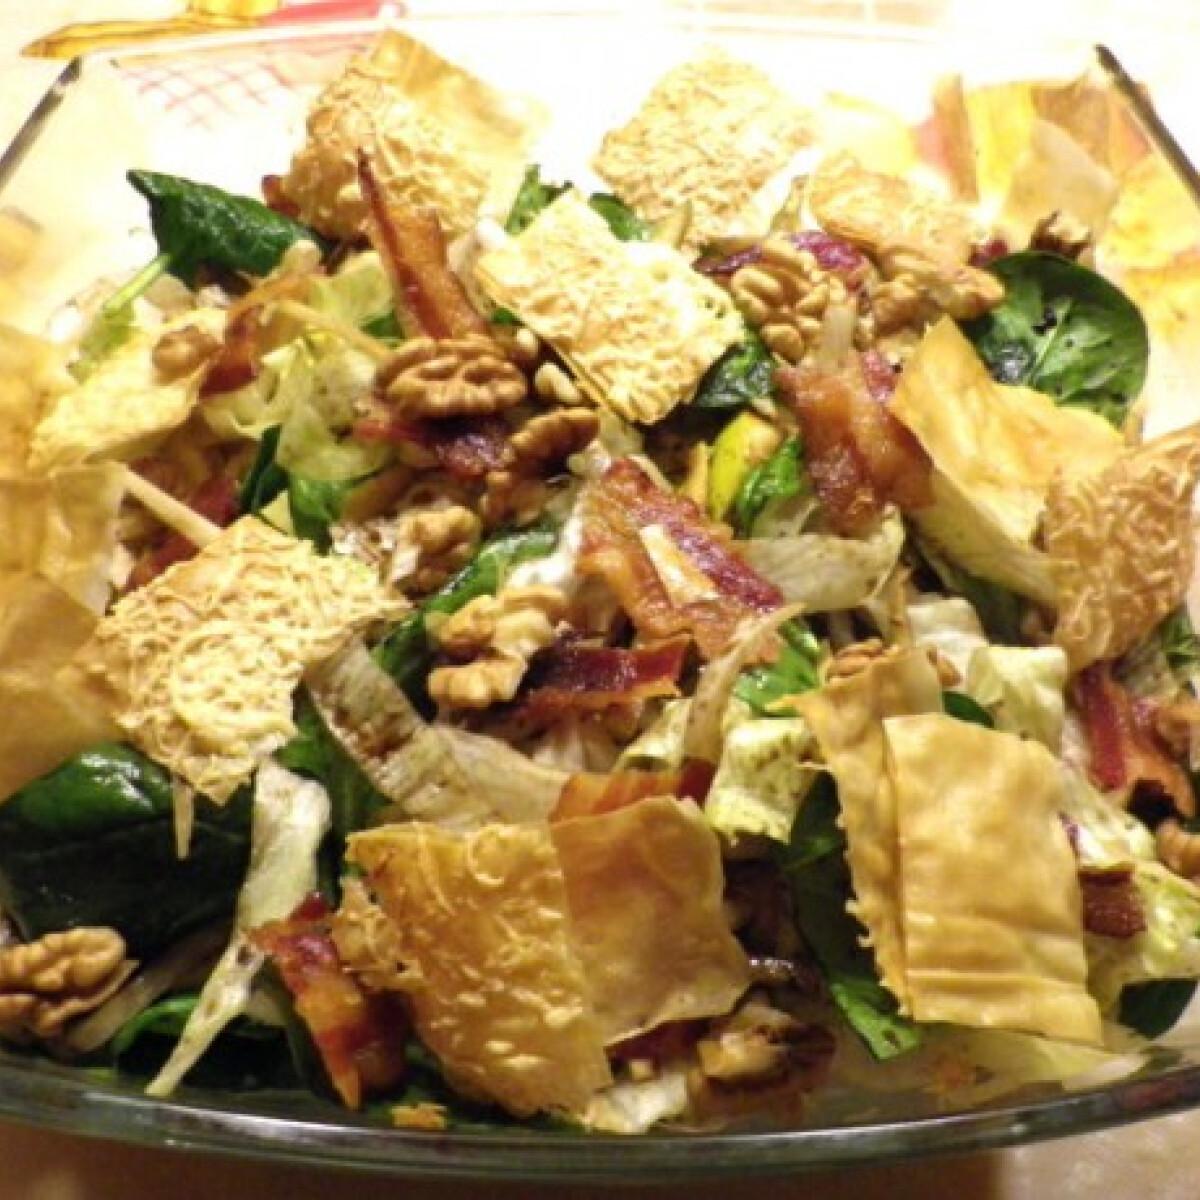 Roppanós saláta